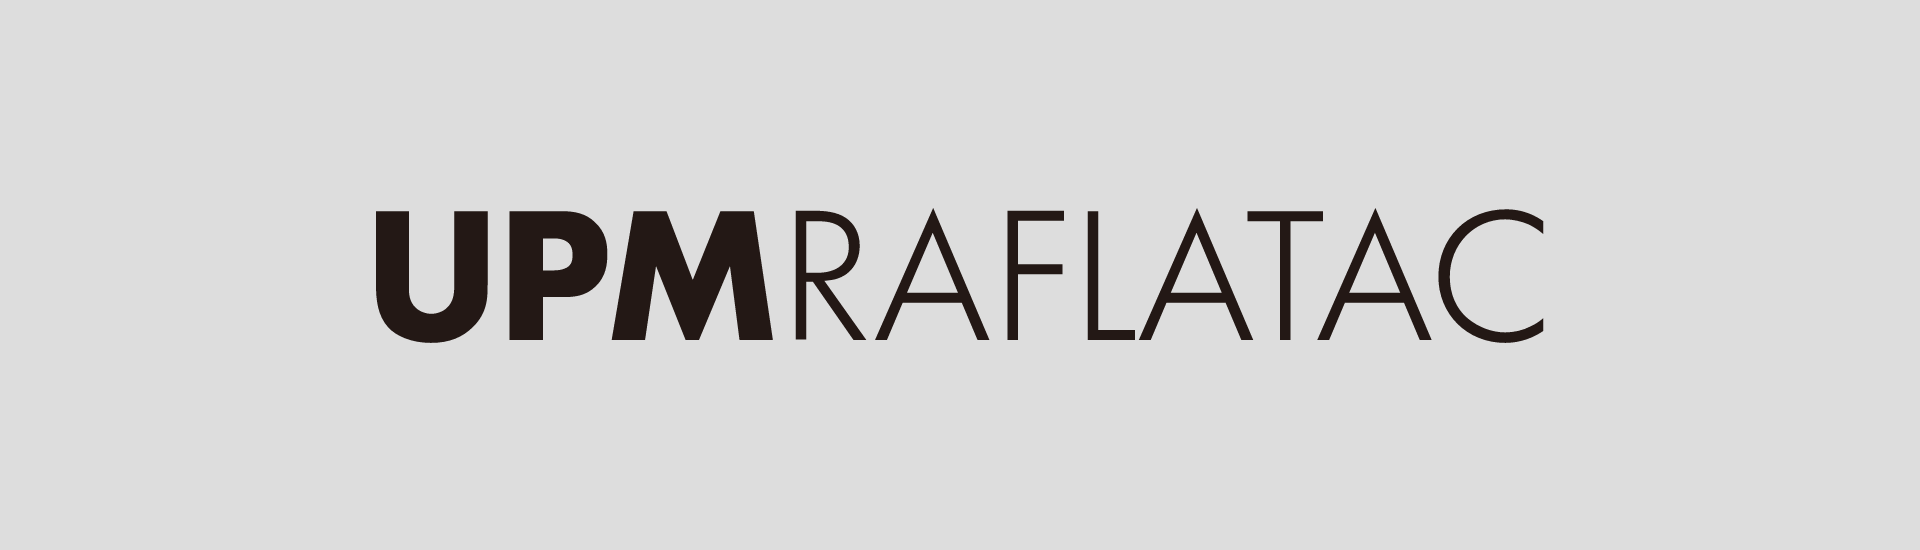 UPM Raflatac - Team management efficiency